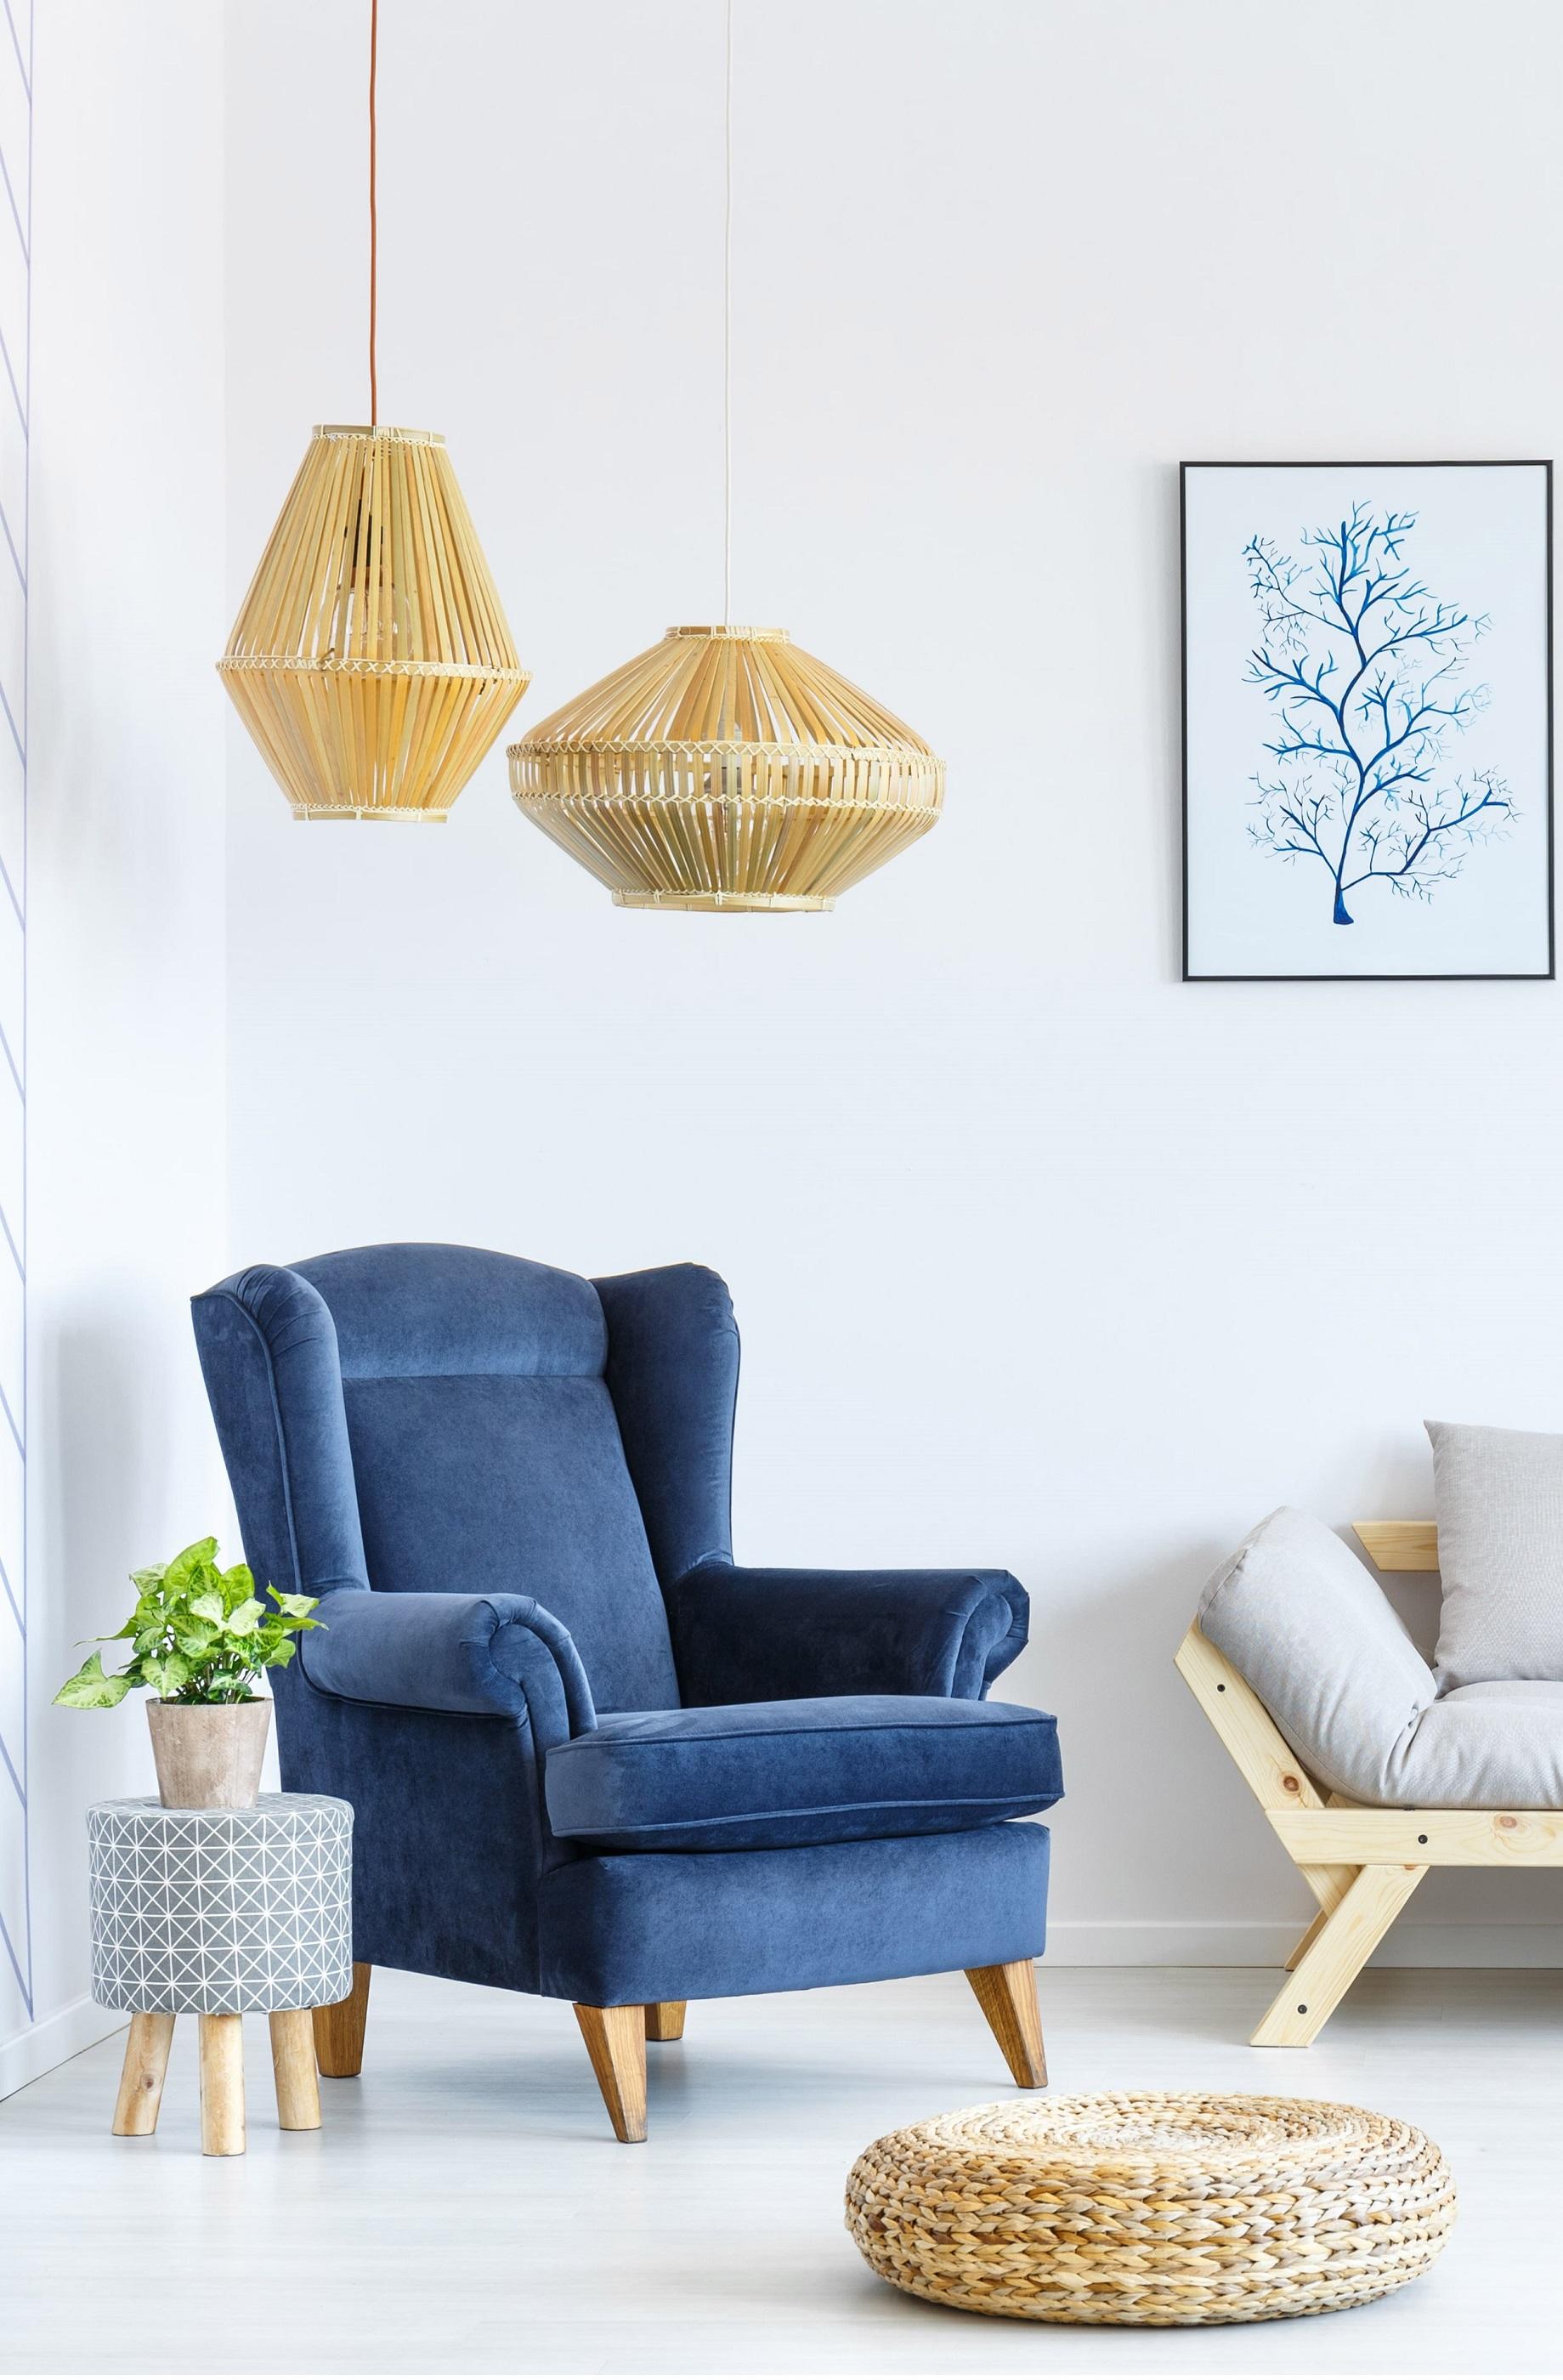 Sofá azul y lámparas de mimbre